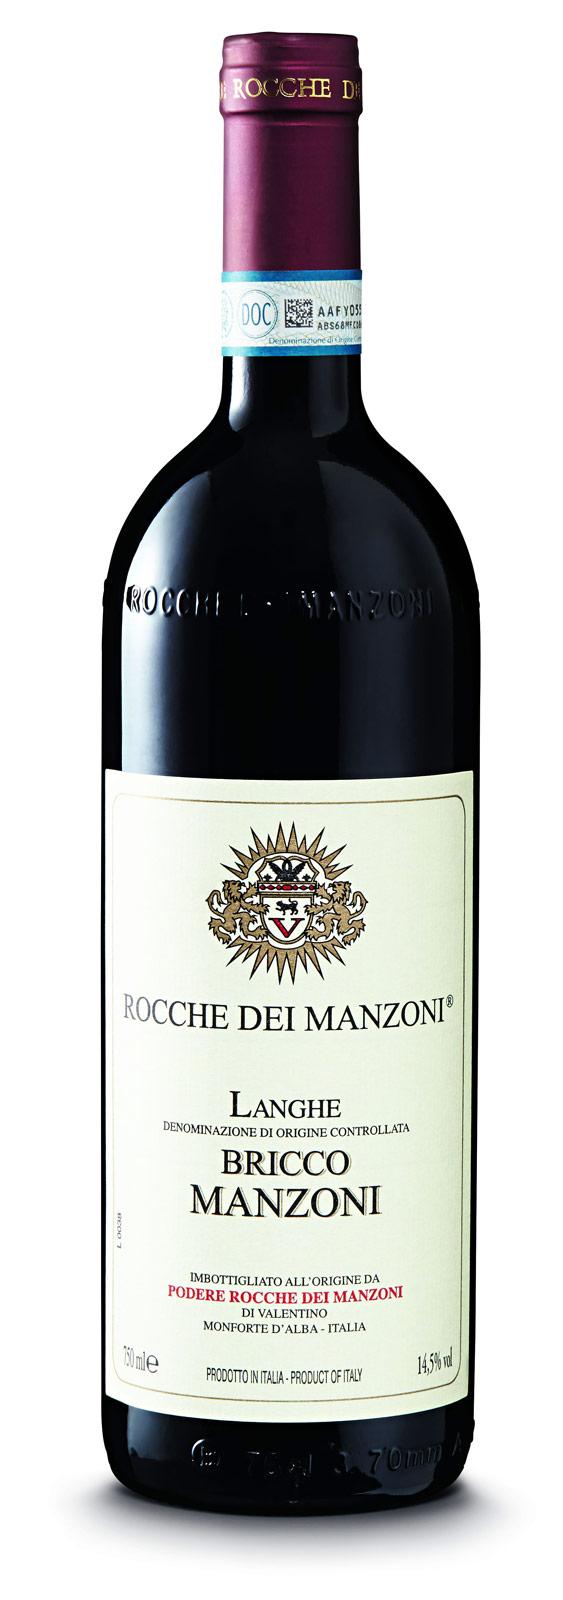 Langhe Rosso Bricco Manzoni